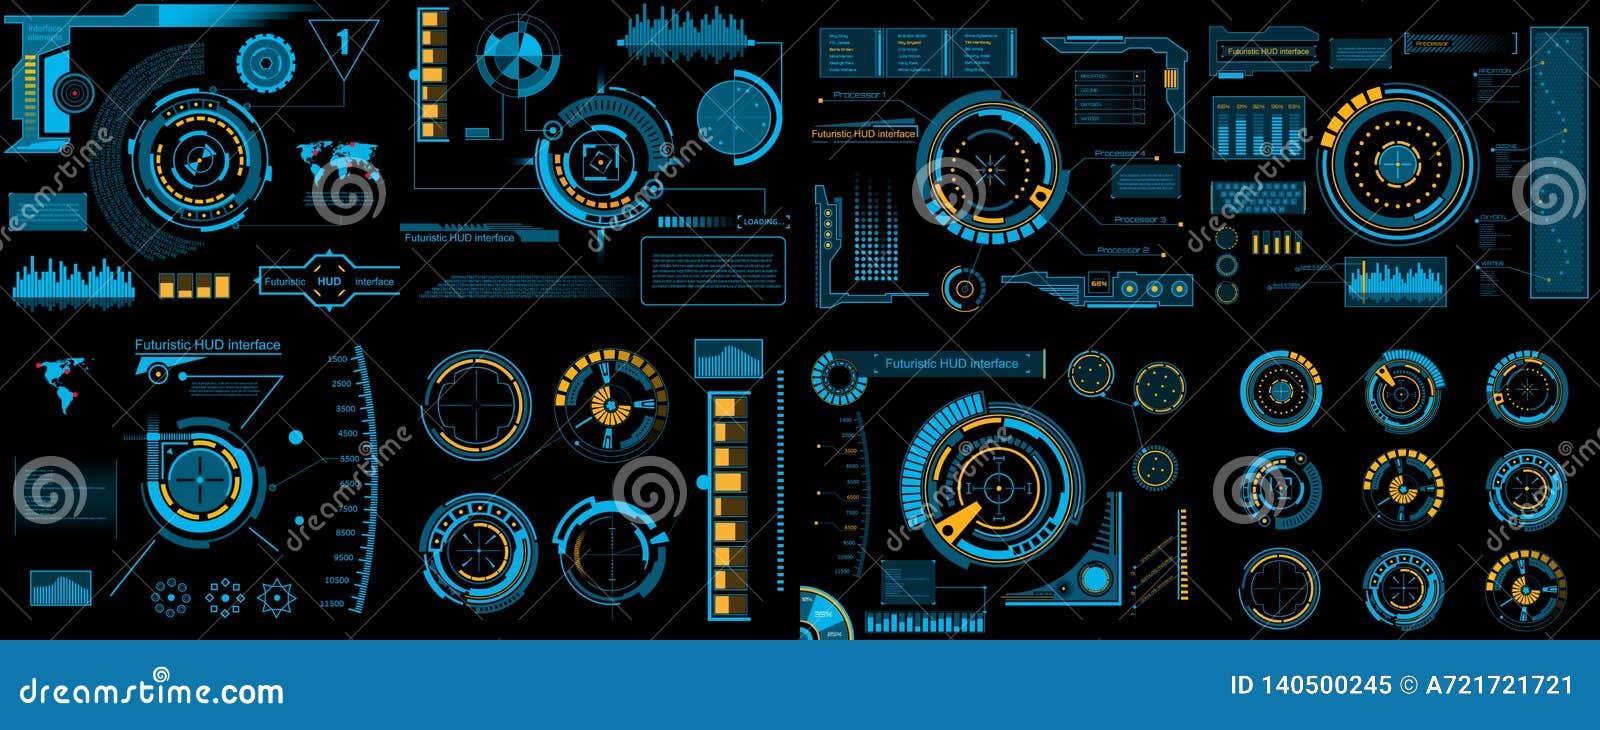 Creative Vector Illustration Of Hud Interface Elements Set